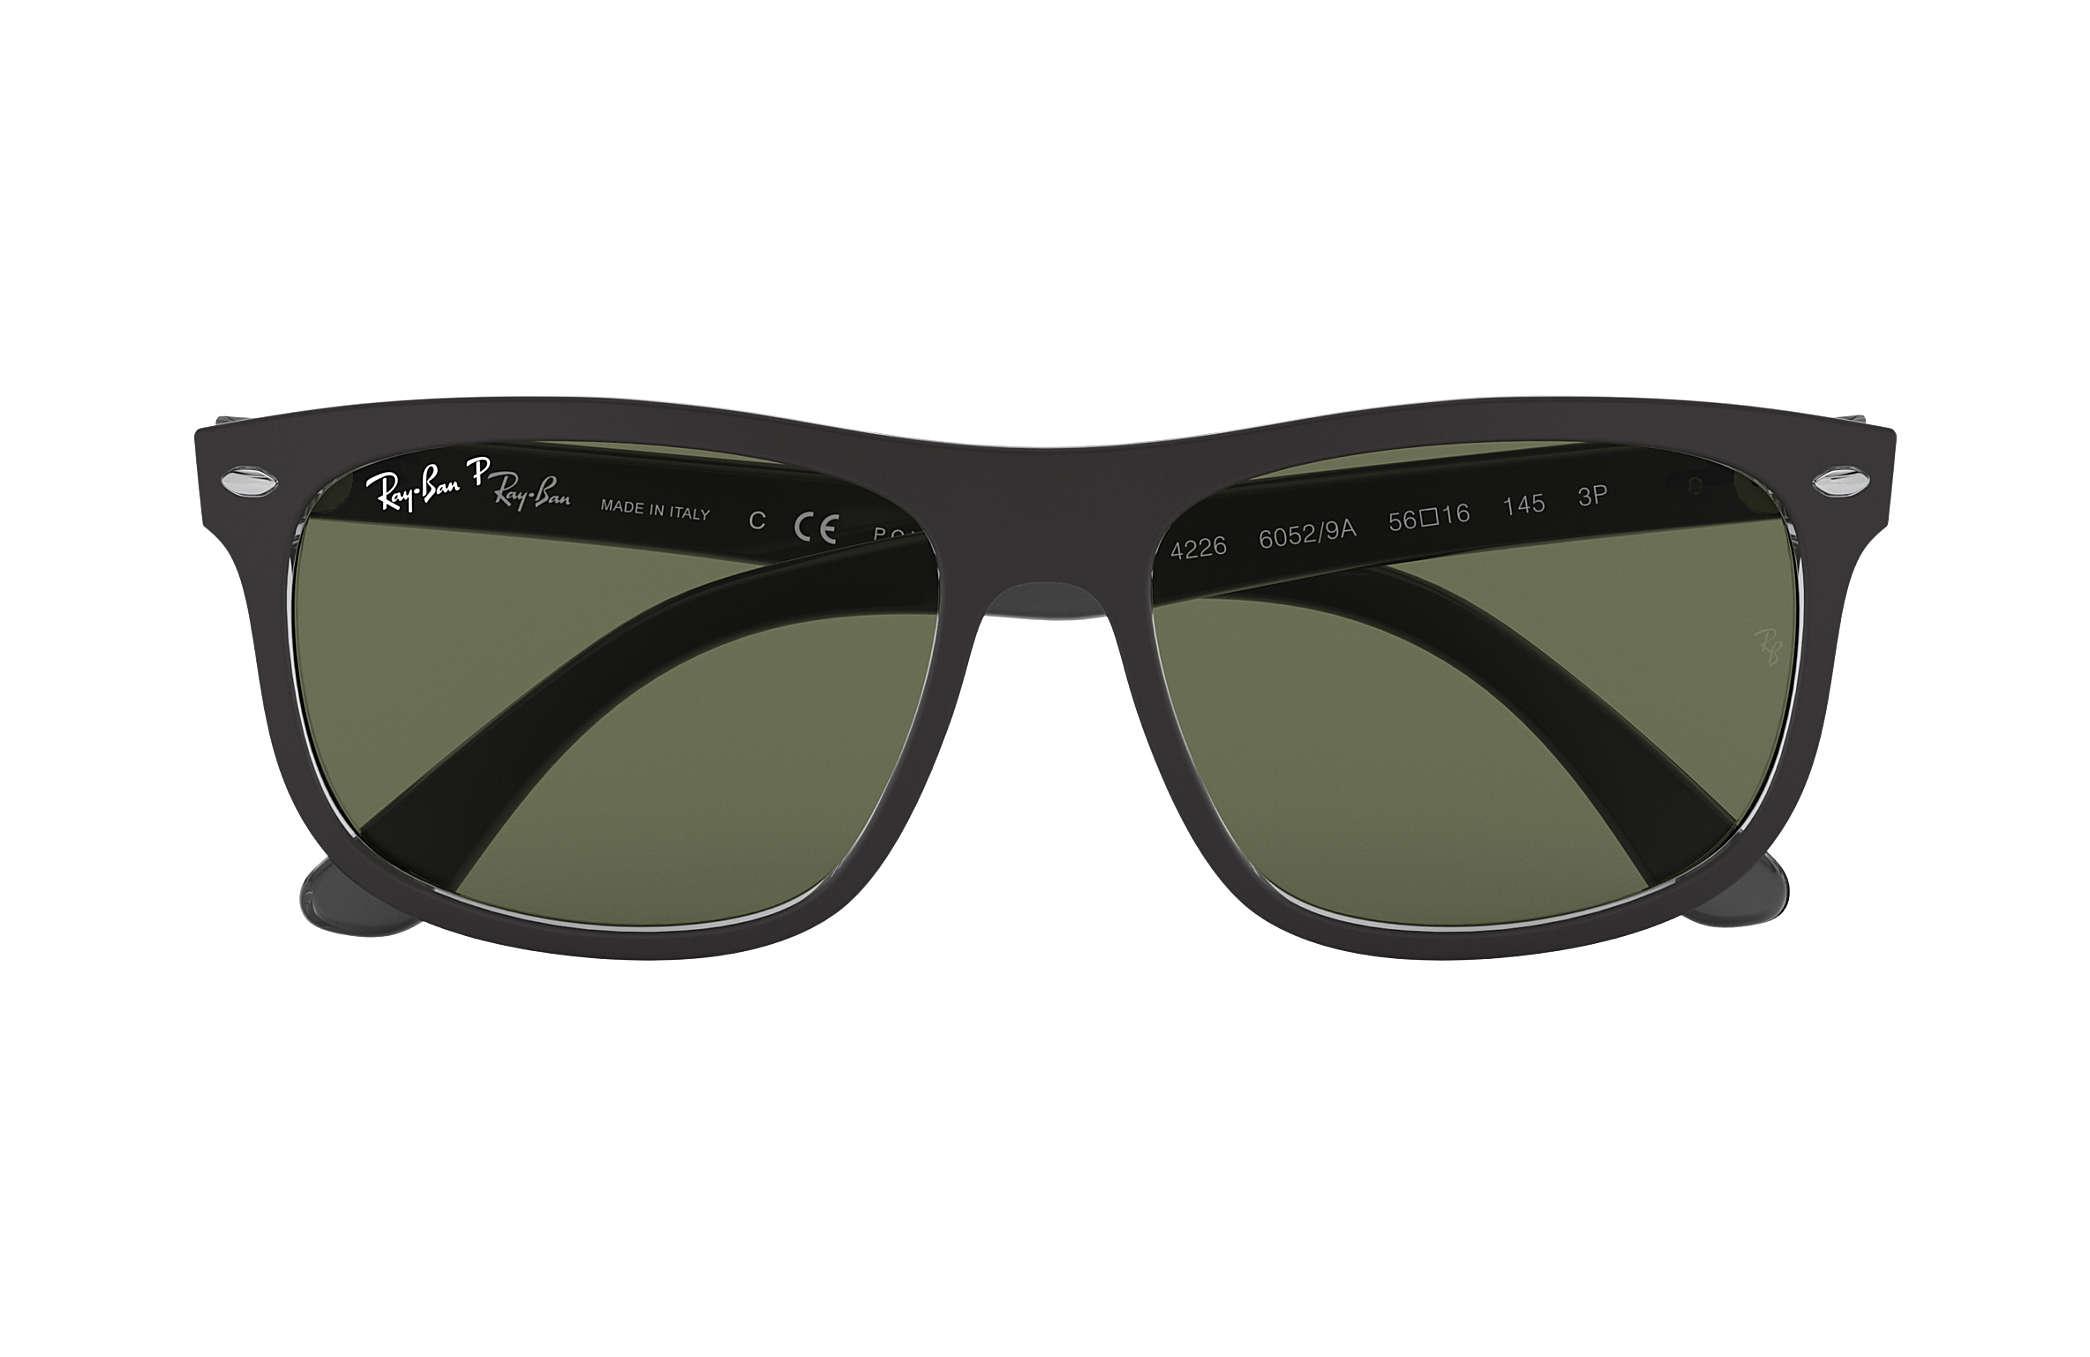 Ray Ban Polarized Sunglasses, RB4226 56